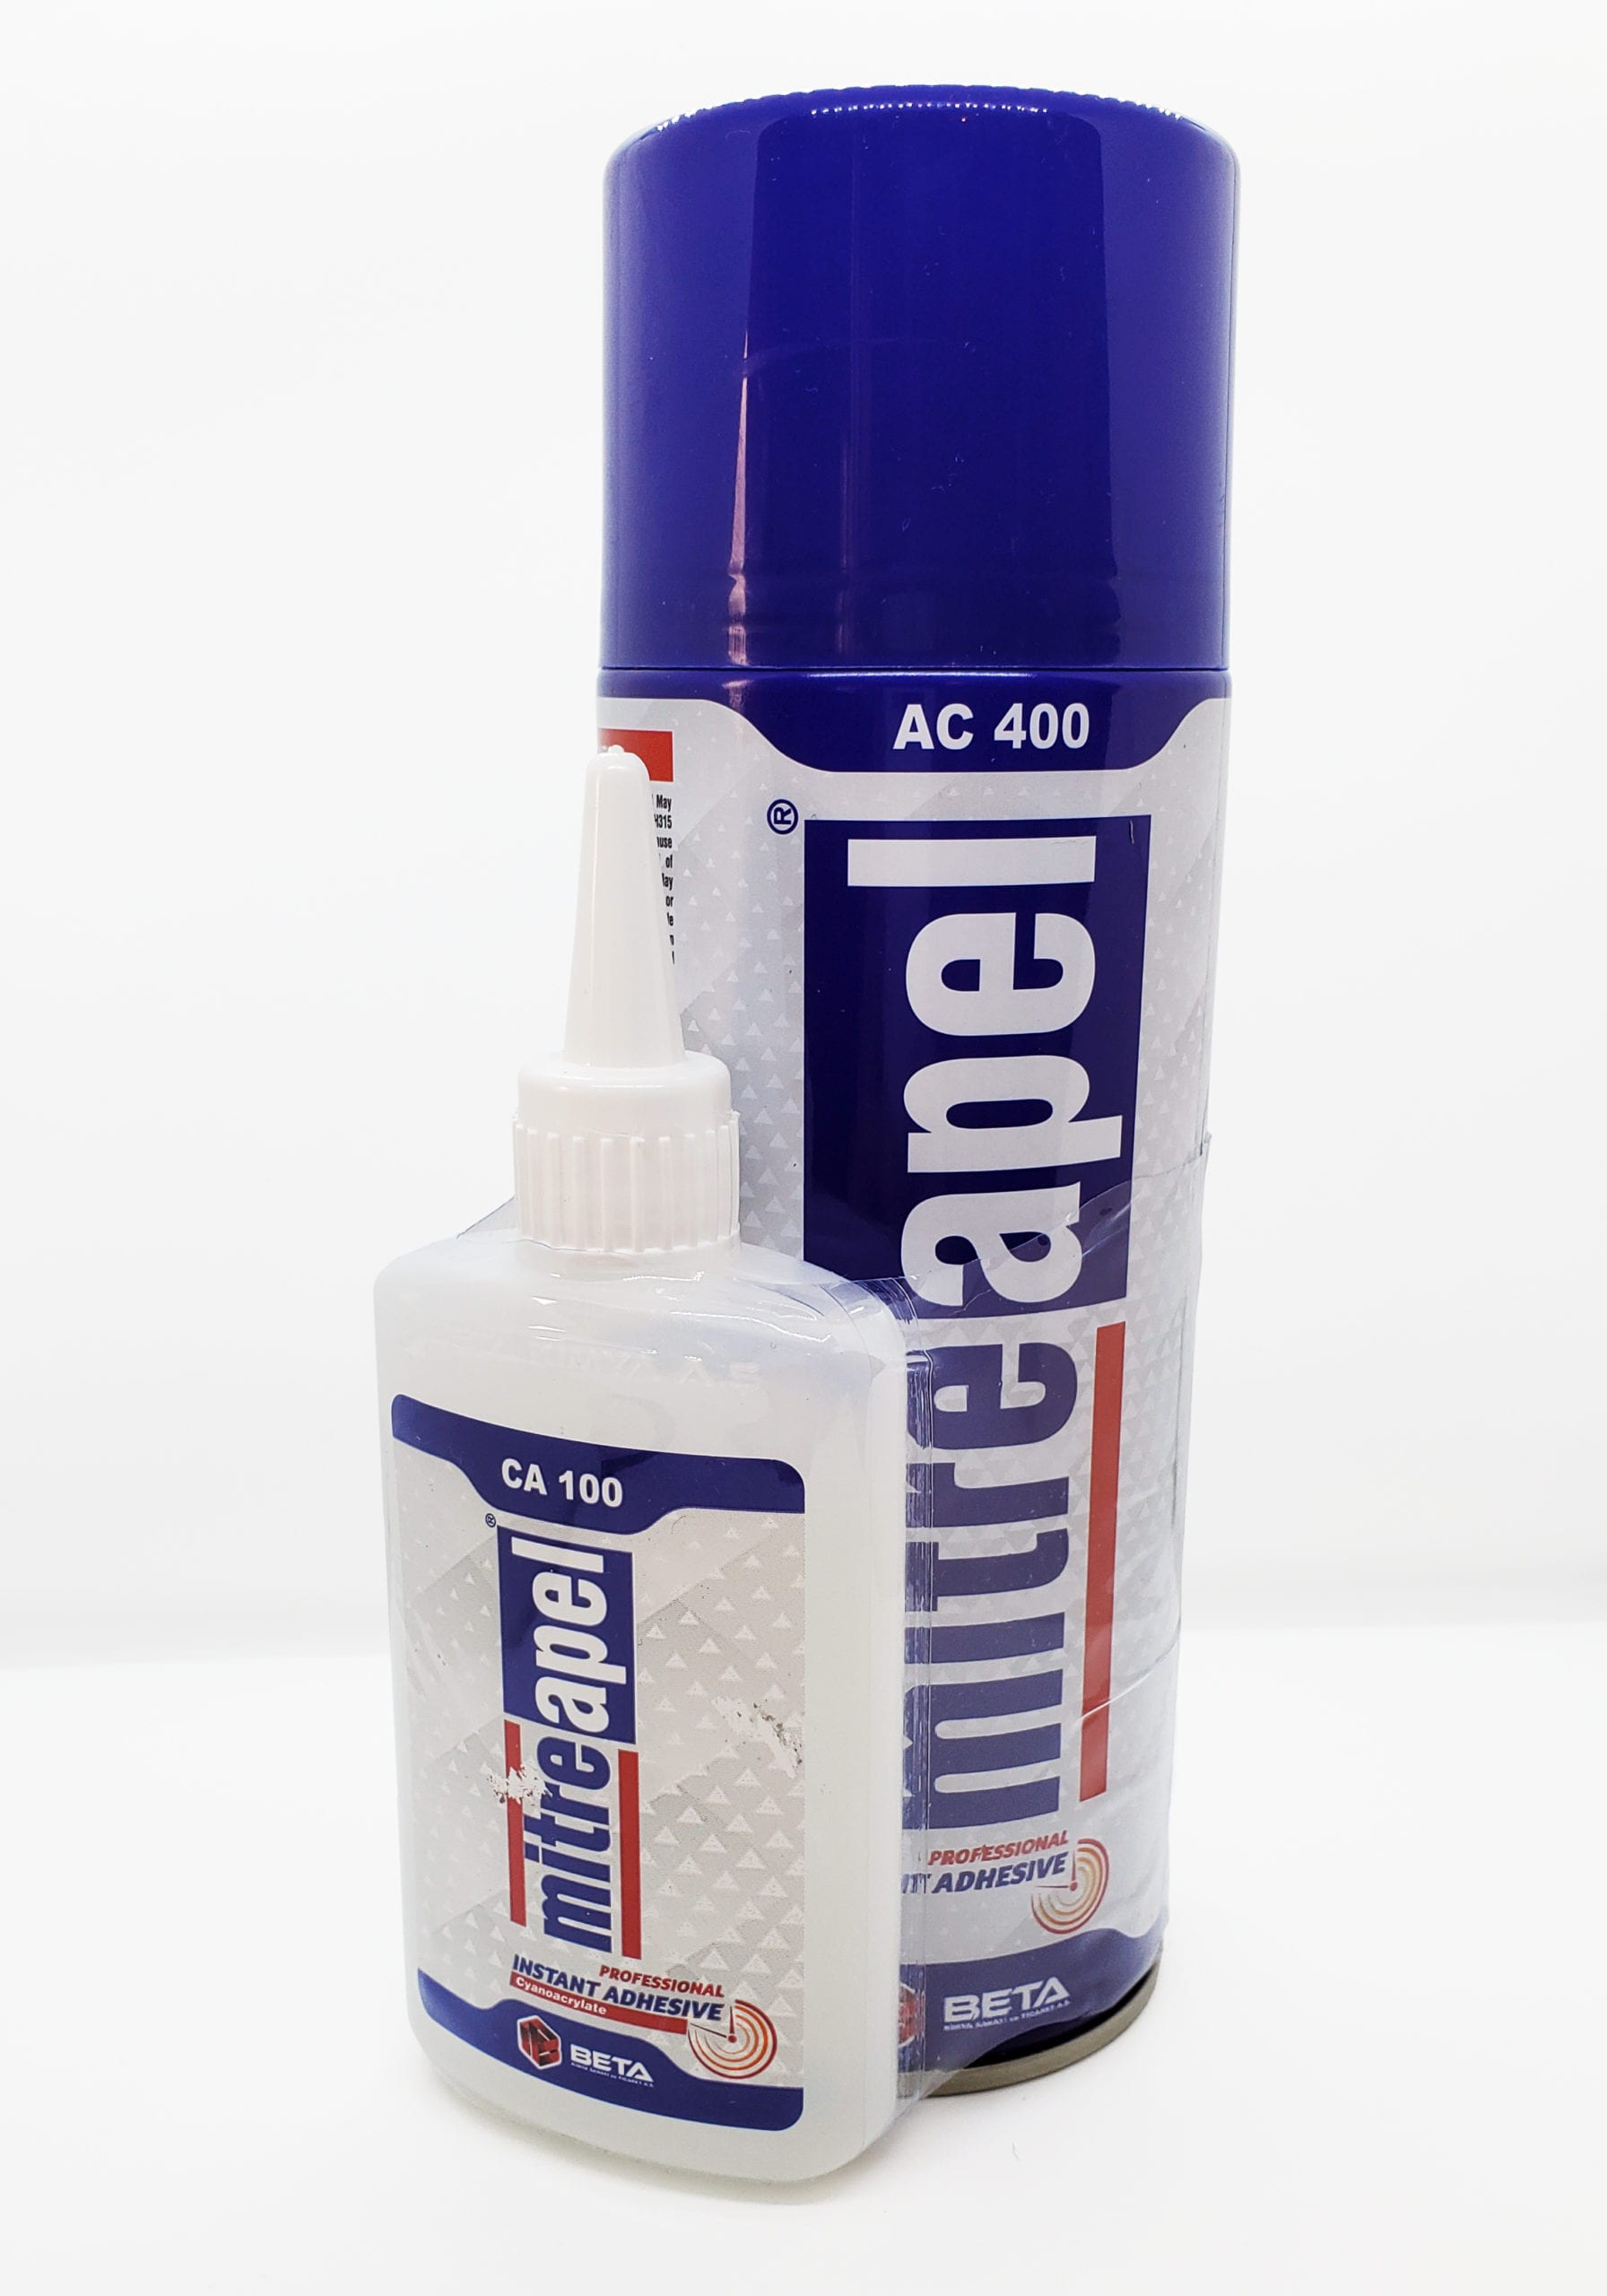 Mitreapel Professional Instant Adhesive_14.99